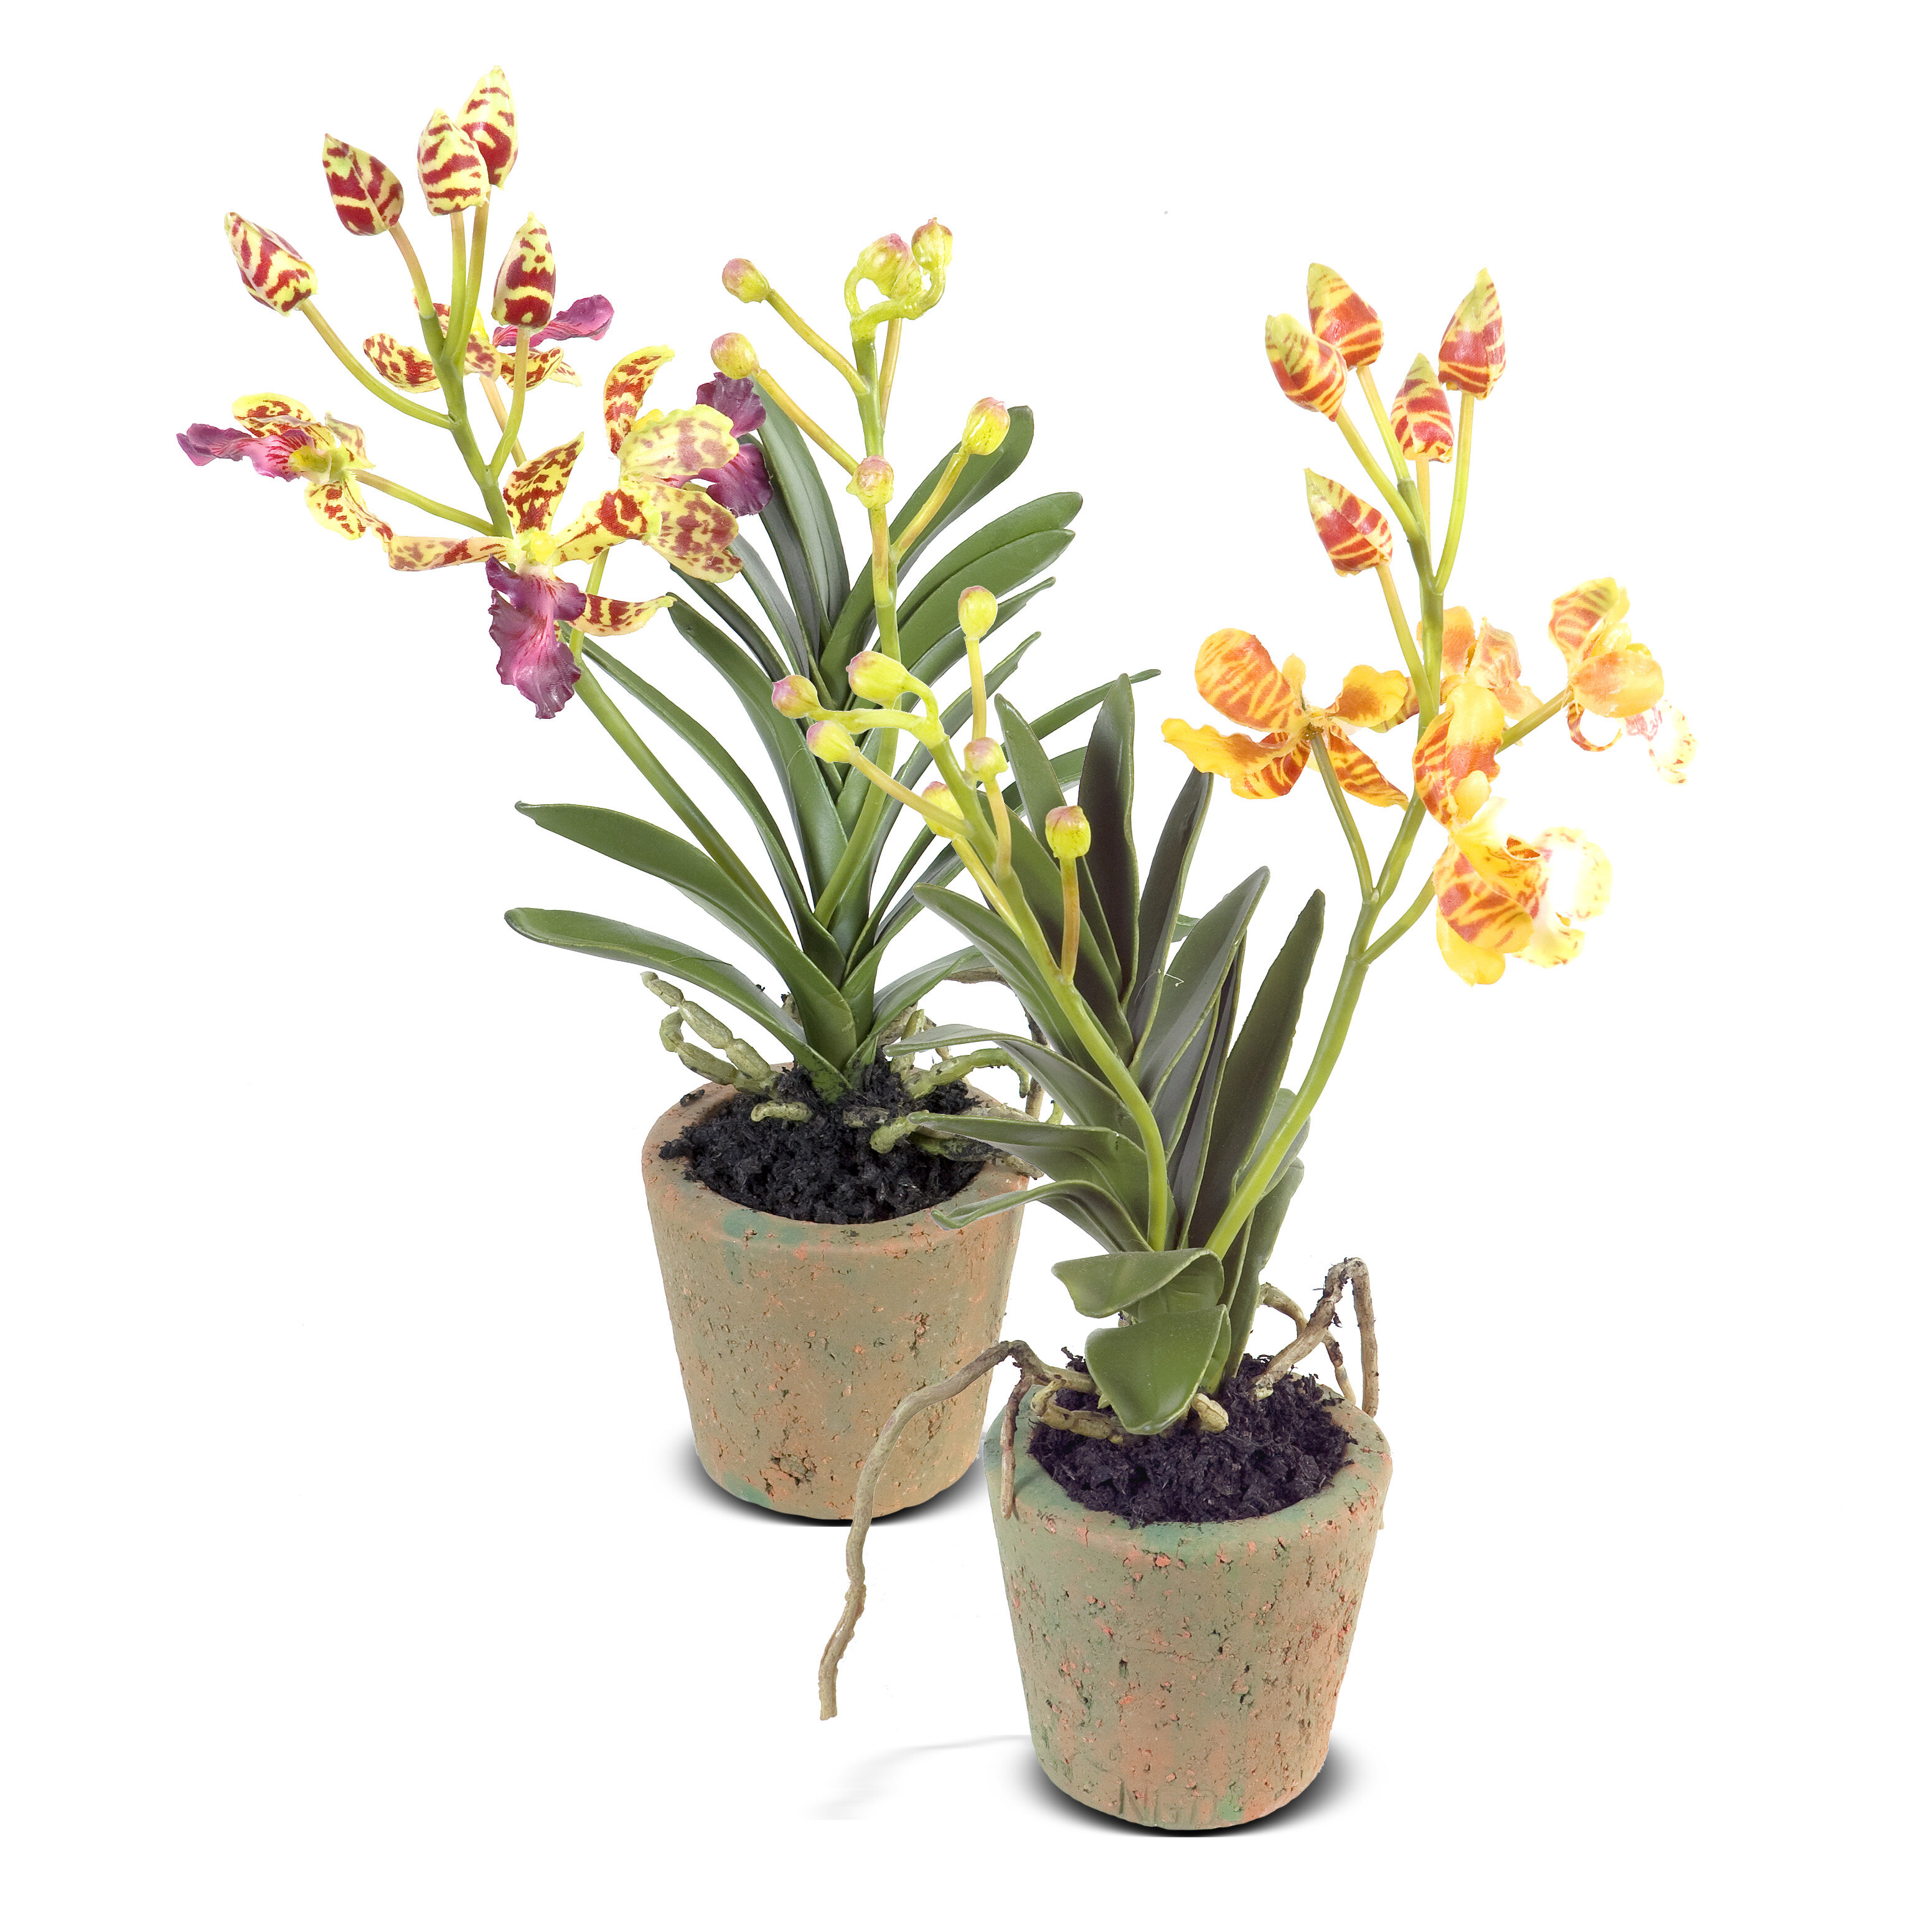 New Growth Designs Faux Vanda Orchid Flower In Pot Wayfair Ca